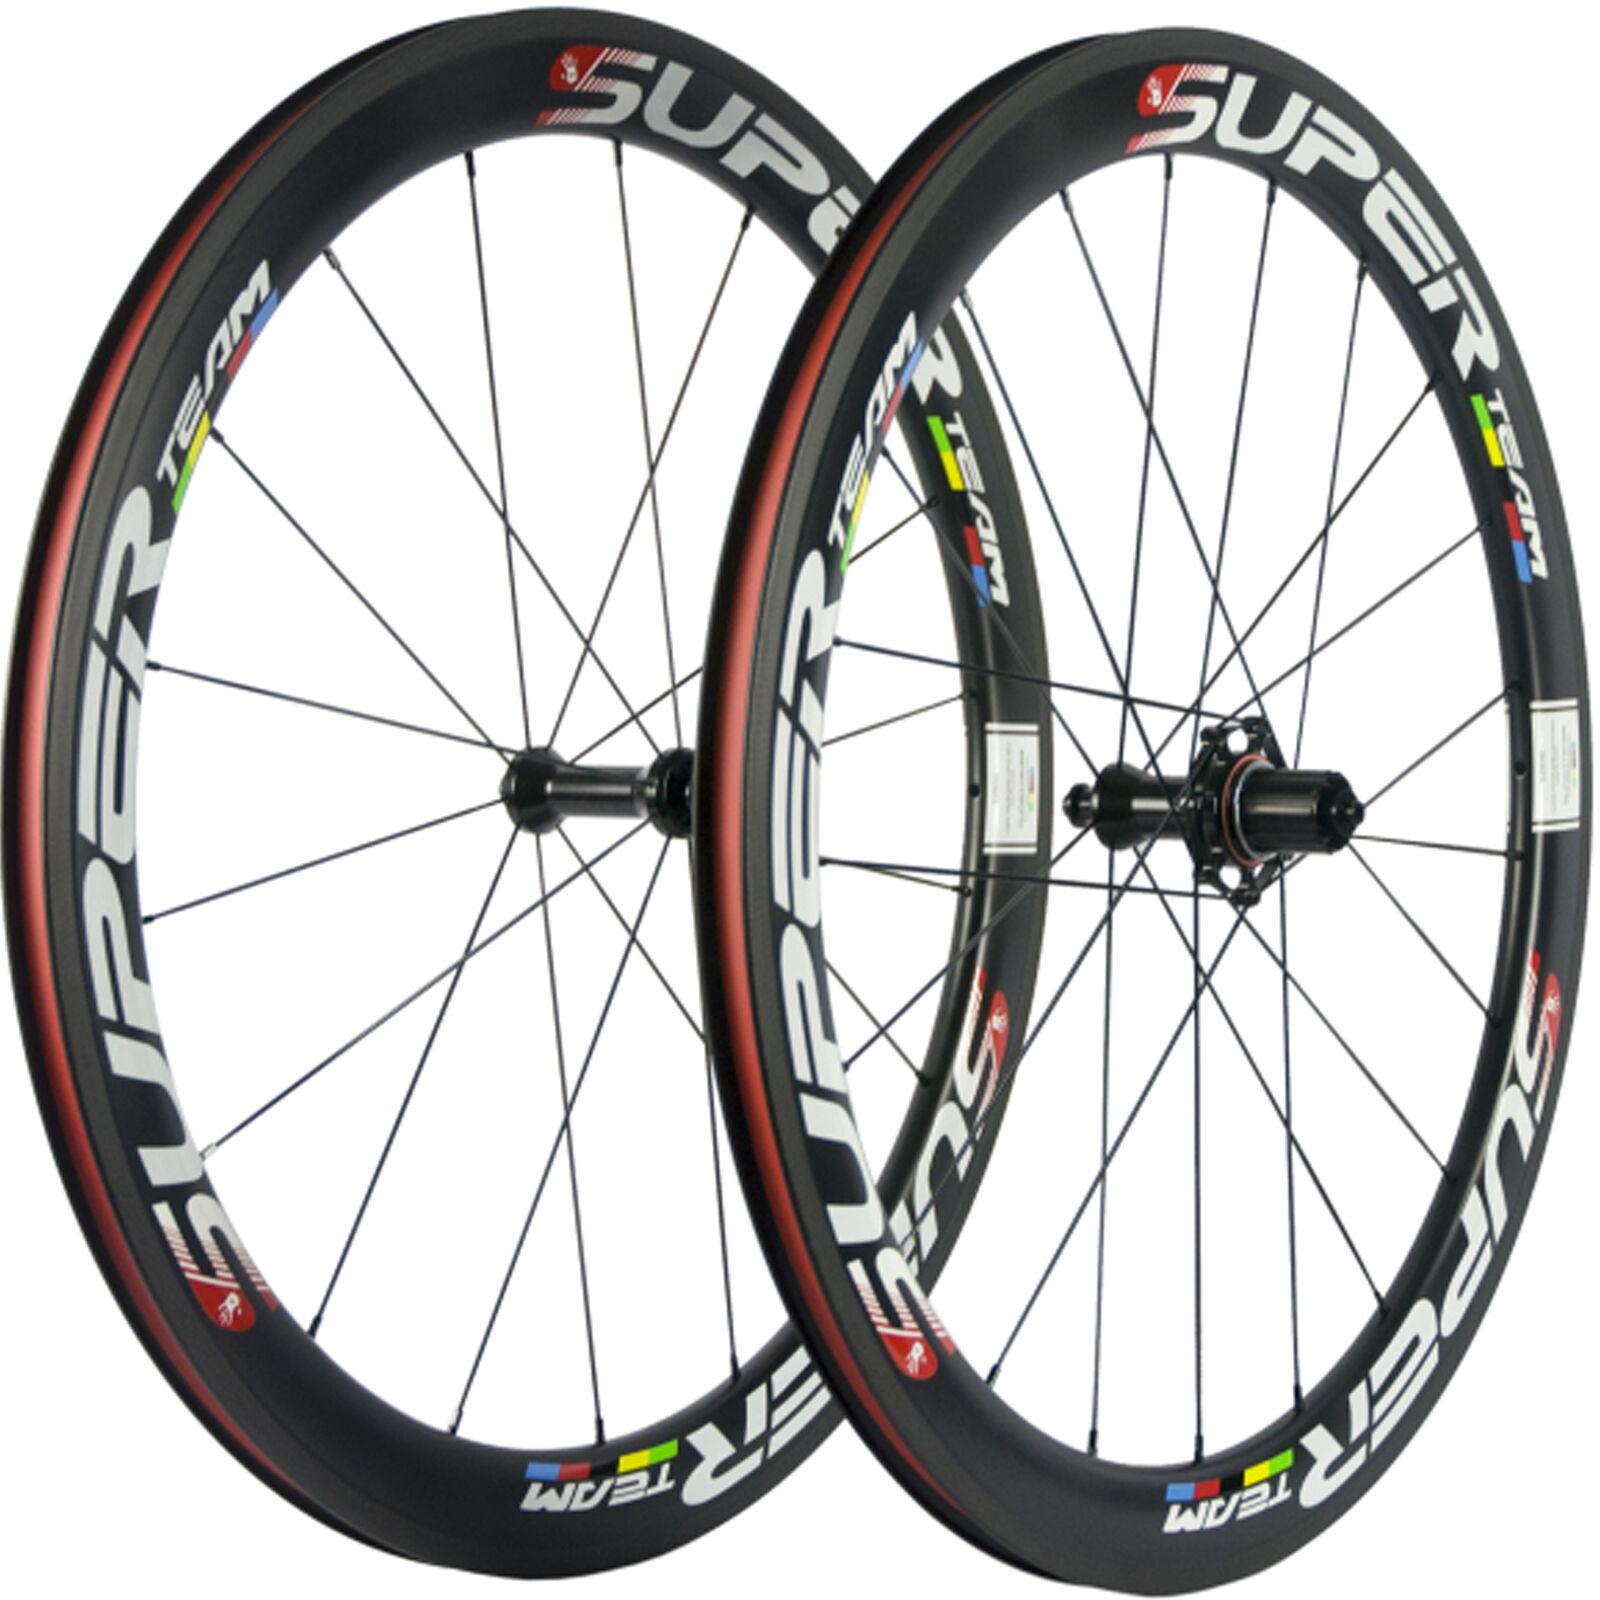 SUPERTEAM Carbon Road Wheels 50mm 25mm Width Carbon  Wheelset UD Matte Race Bike  store sale outlet